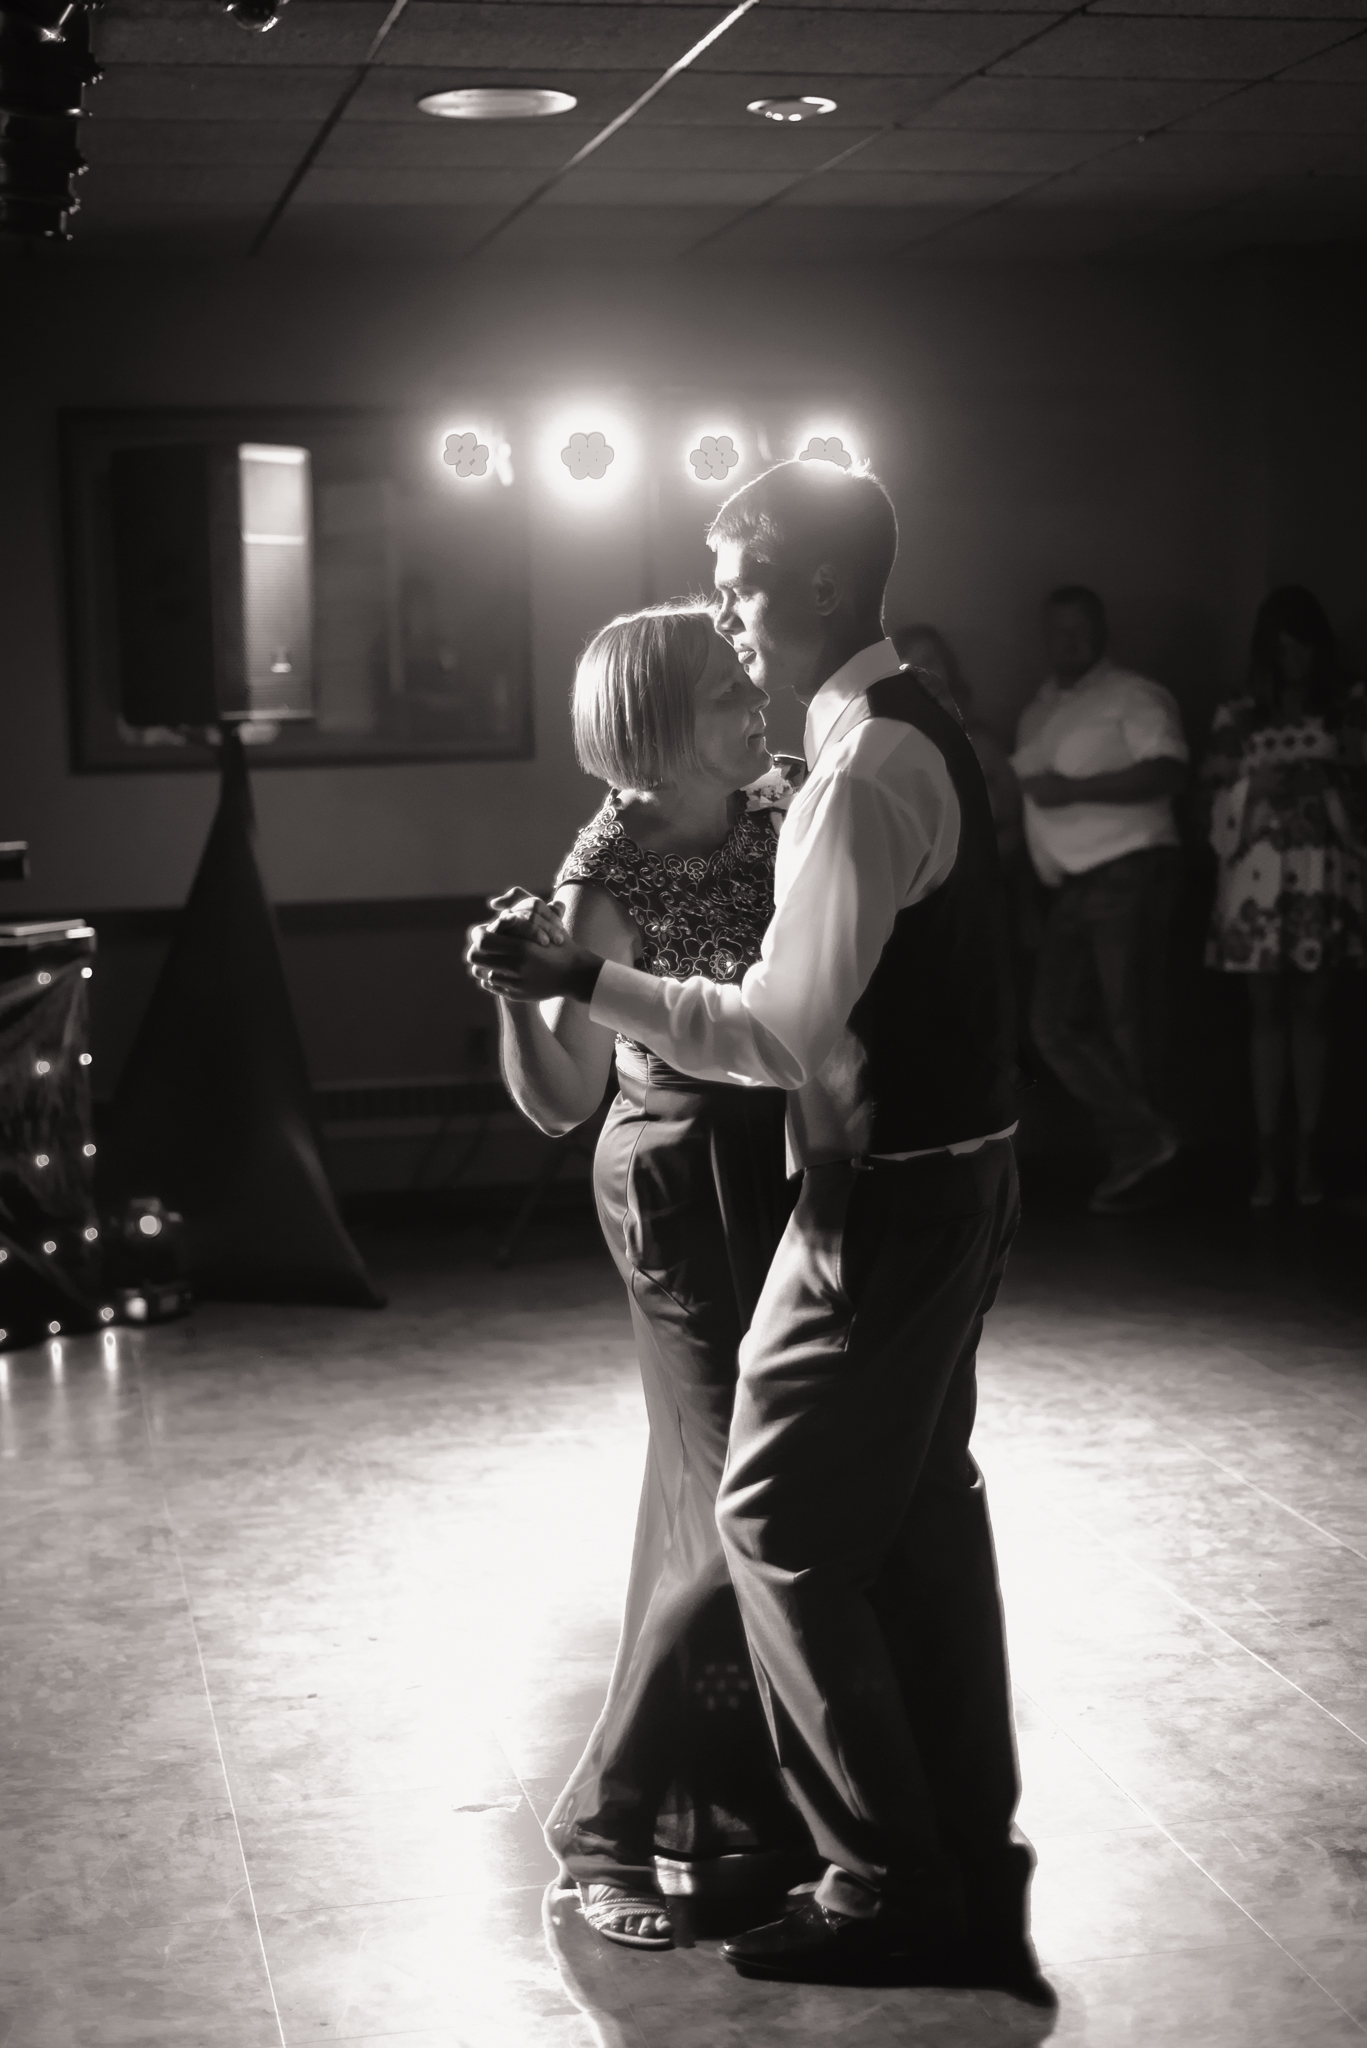 50-ashland washburn wedding photographyDSC_6108.jpg